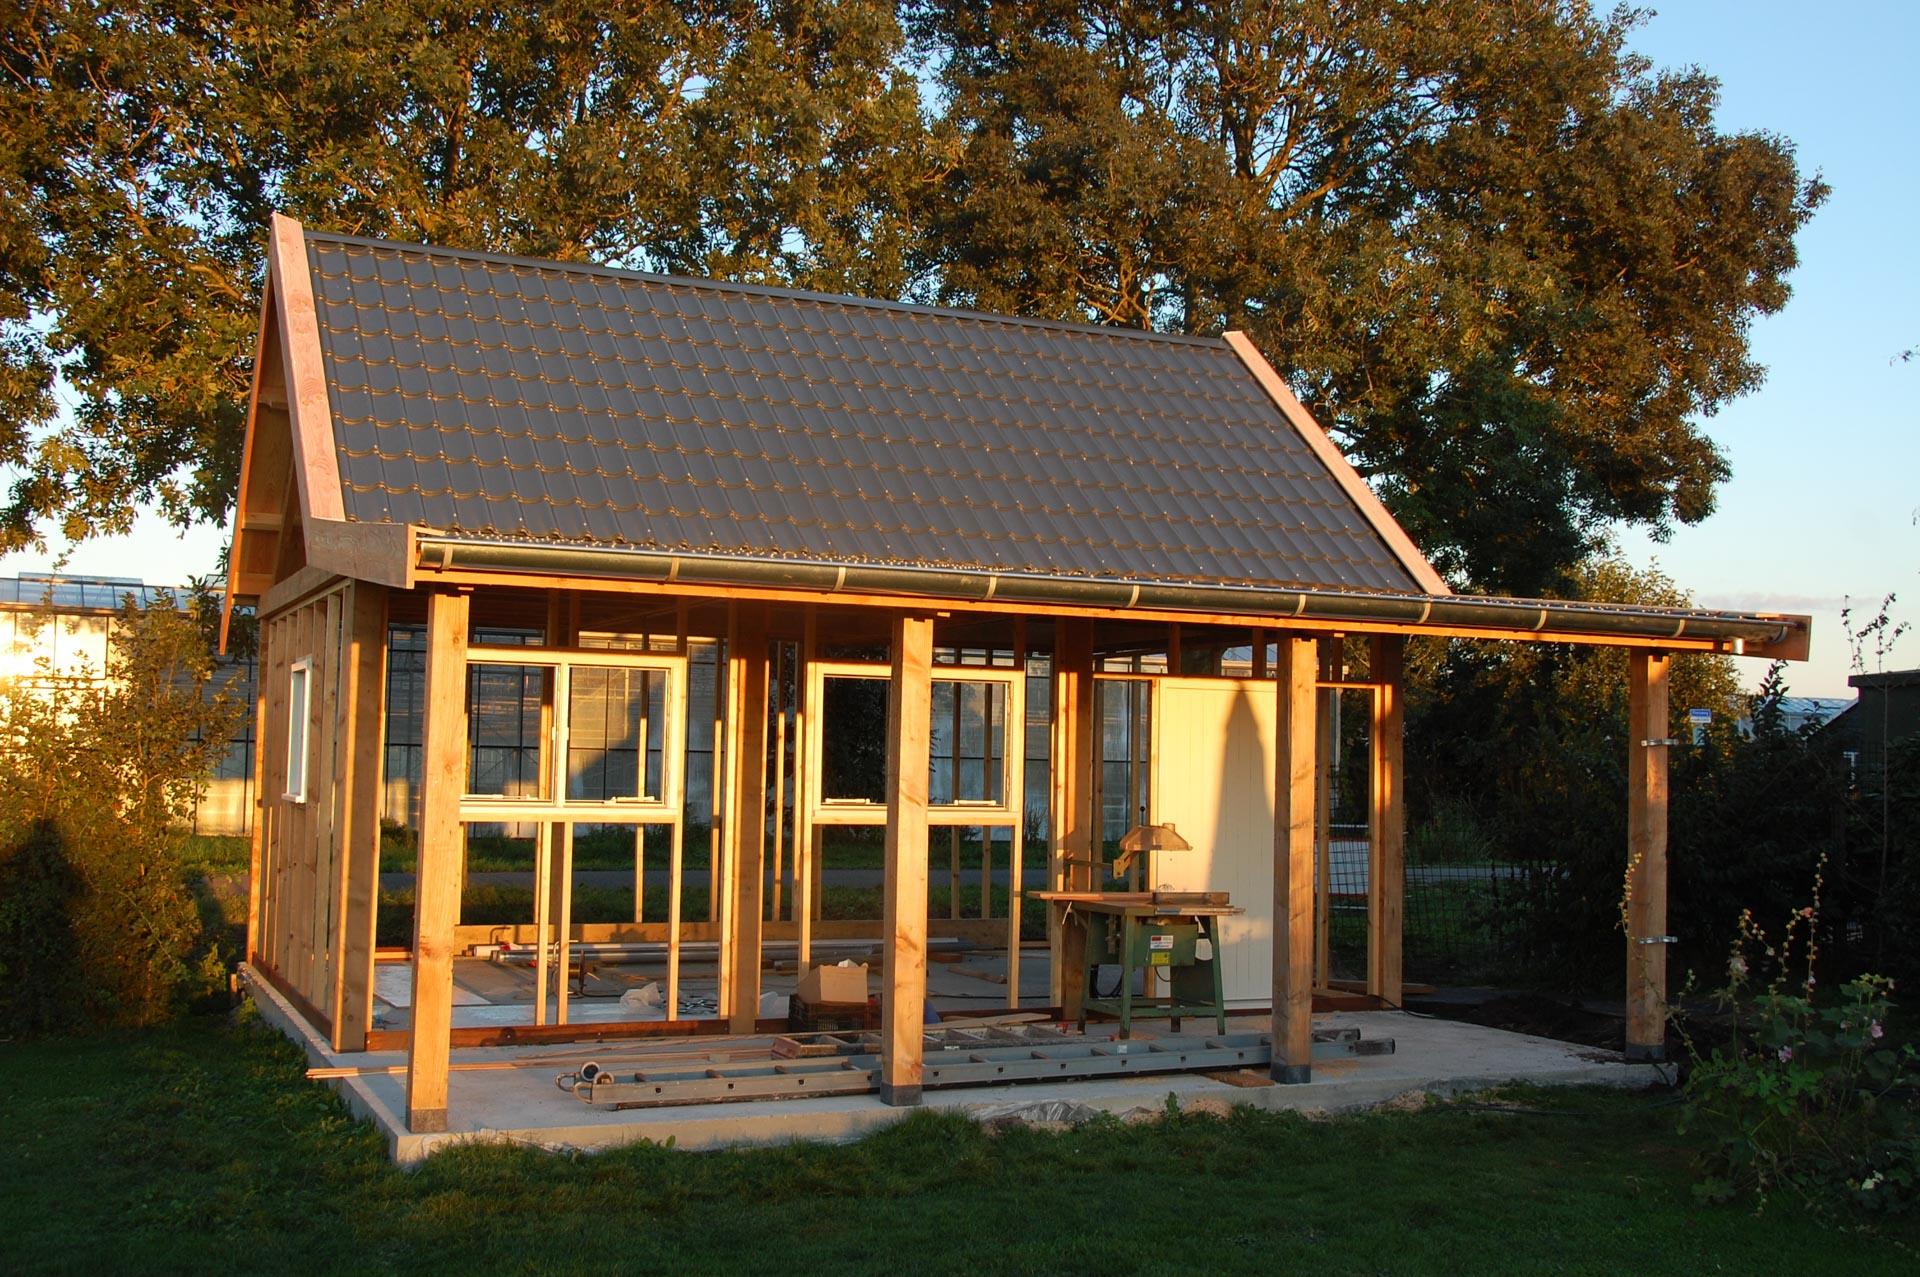 vos-hoveniers-project-tuinhuis-23